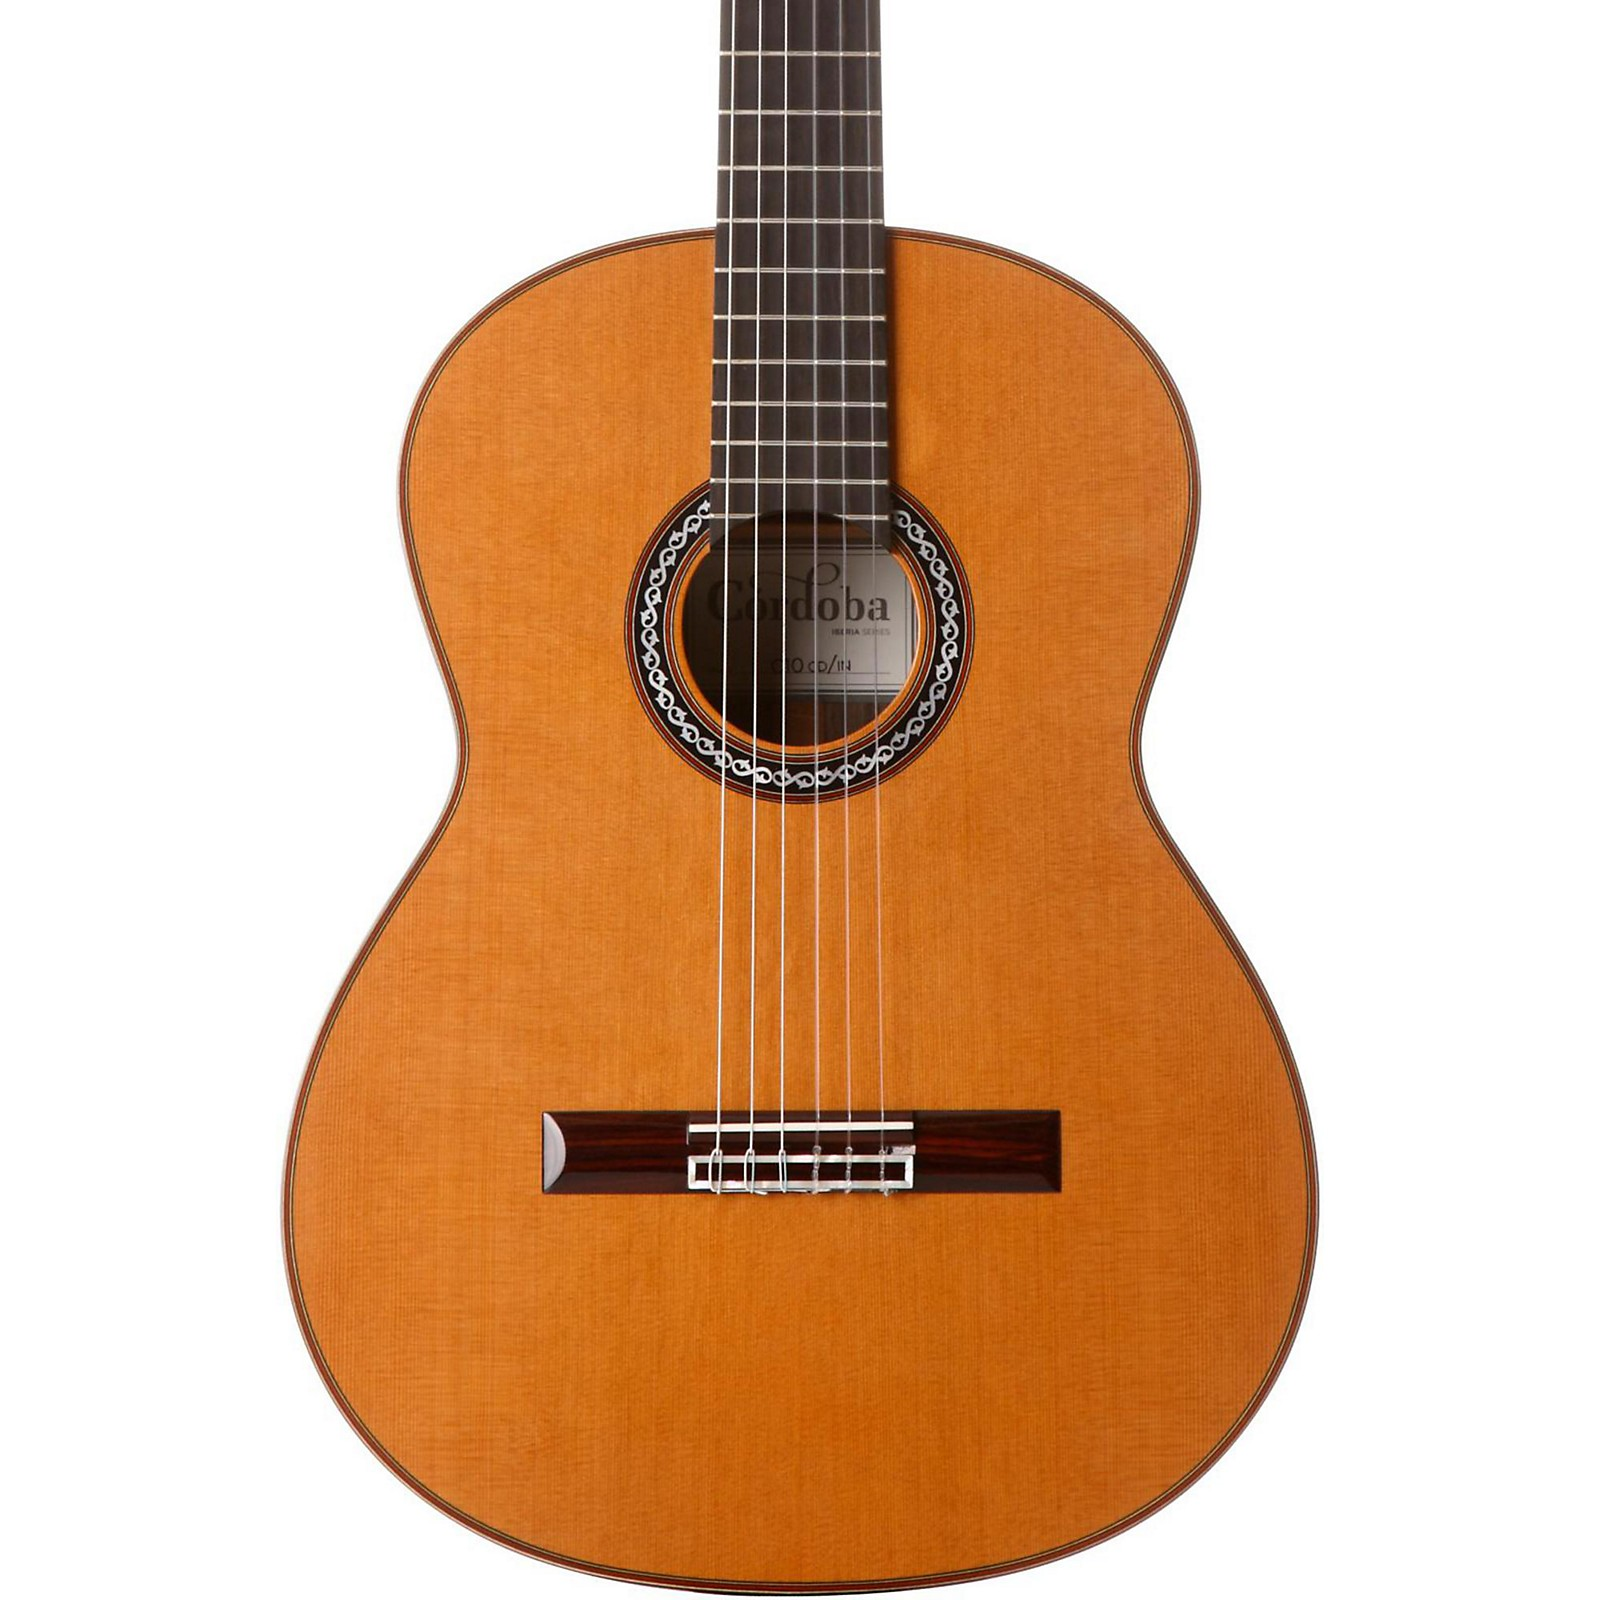 Cordoba C9 CD/MH Acoustic Nylon String Classical Guitar